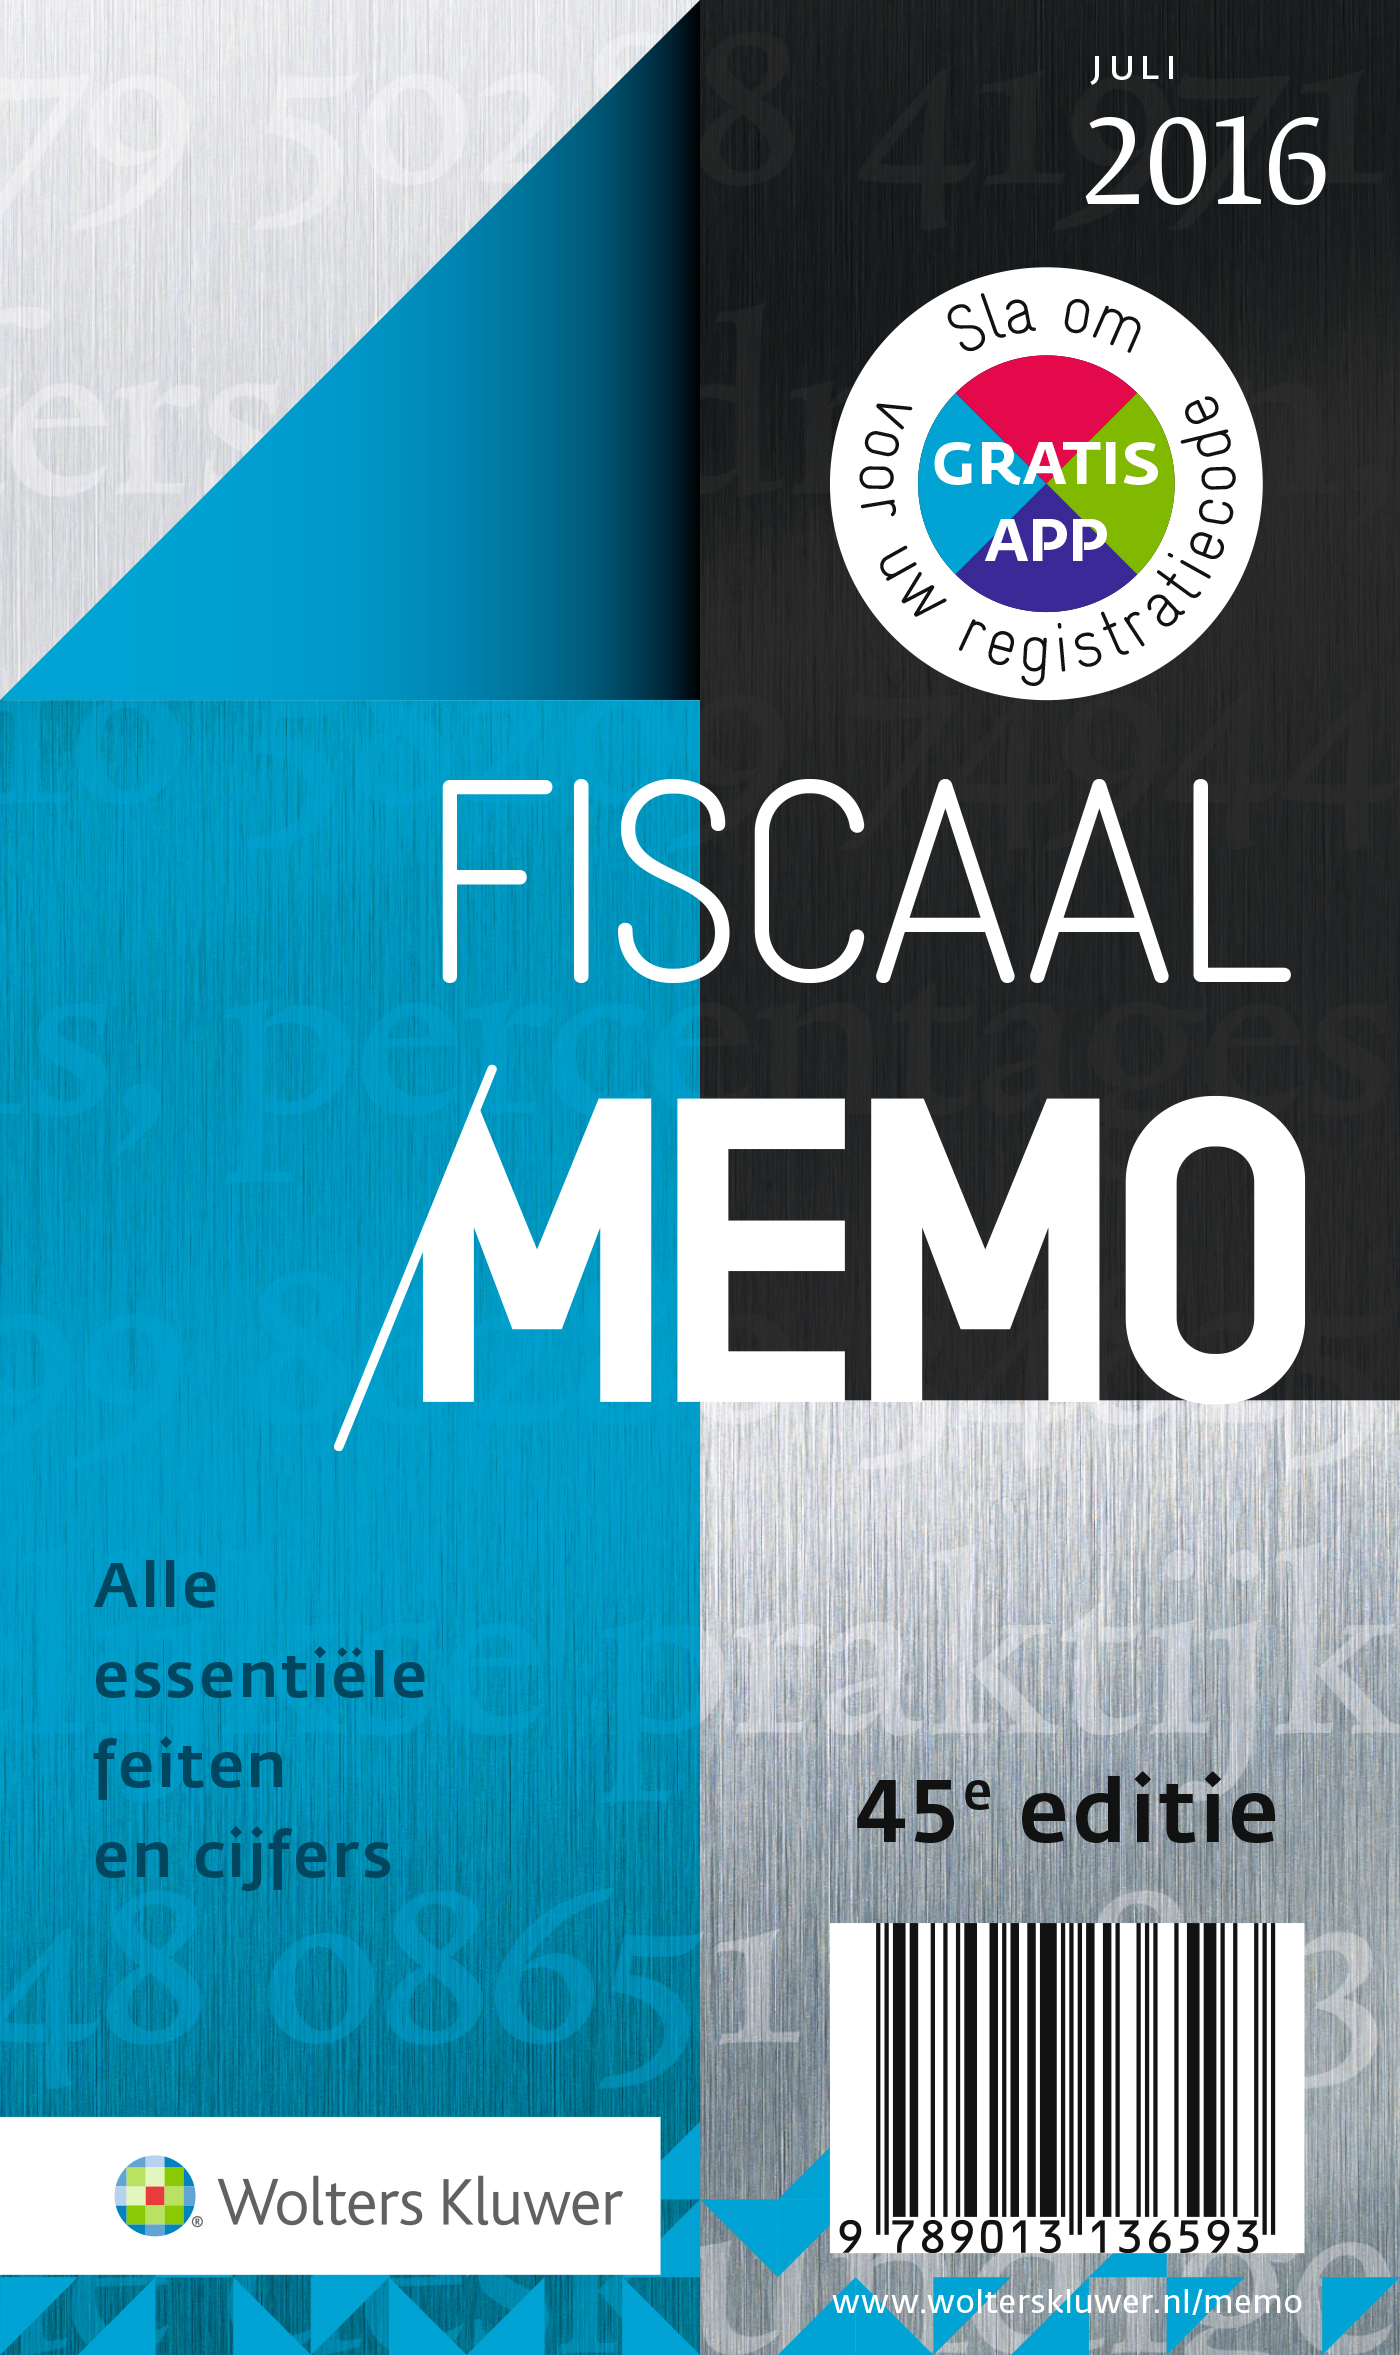 Fiscaal memo juli 2016